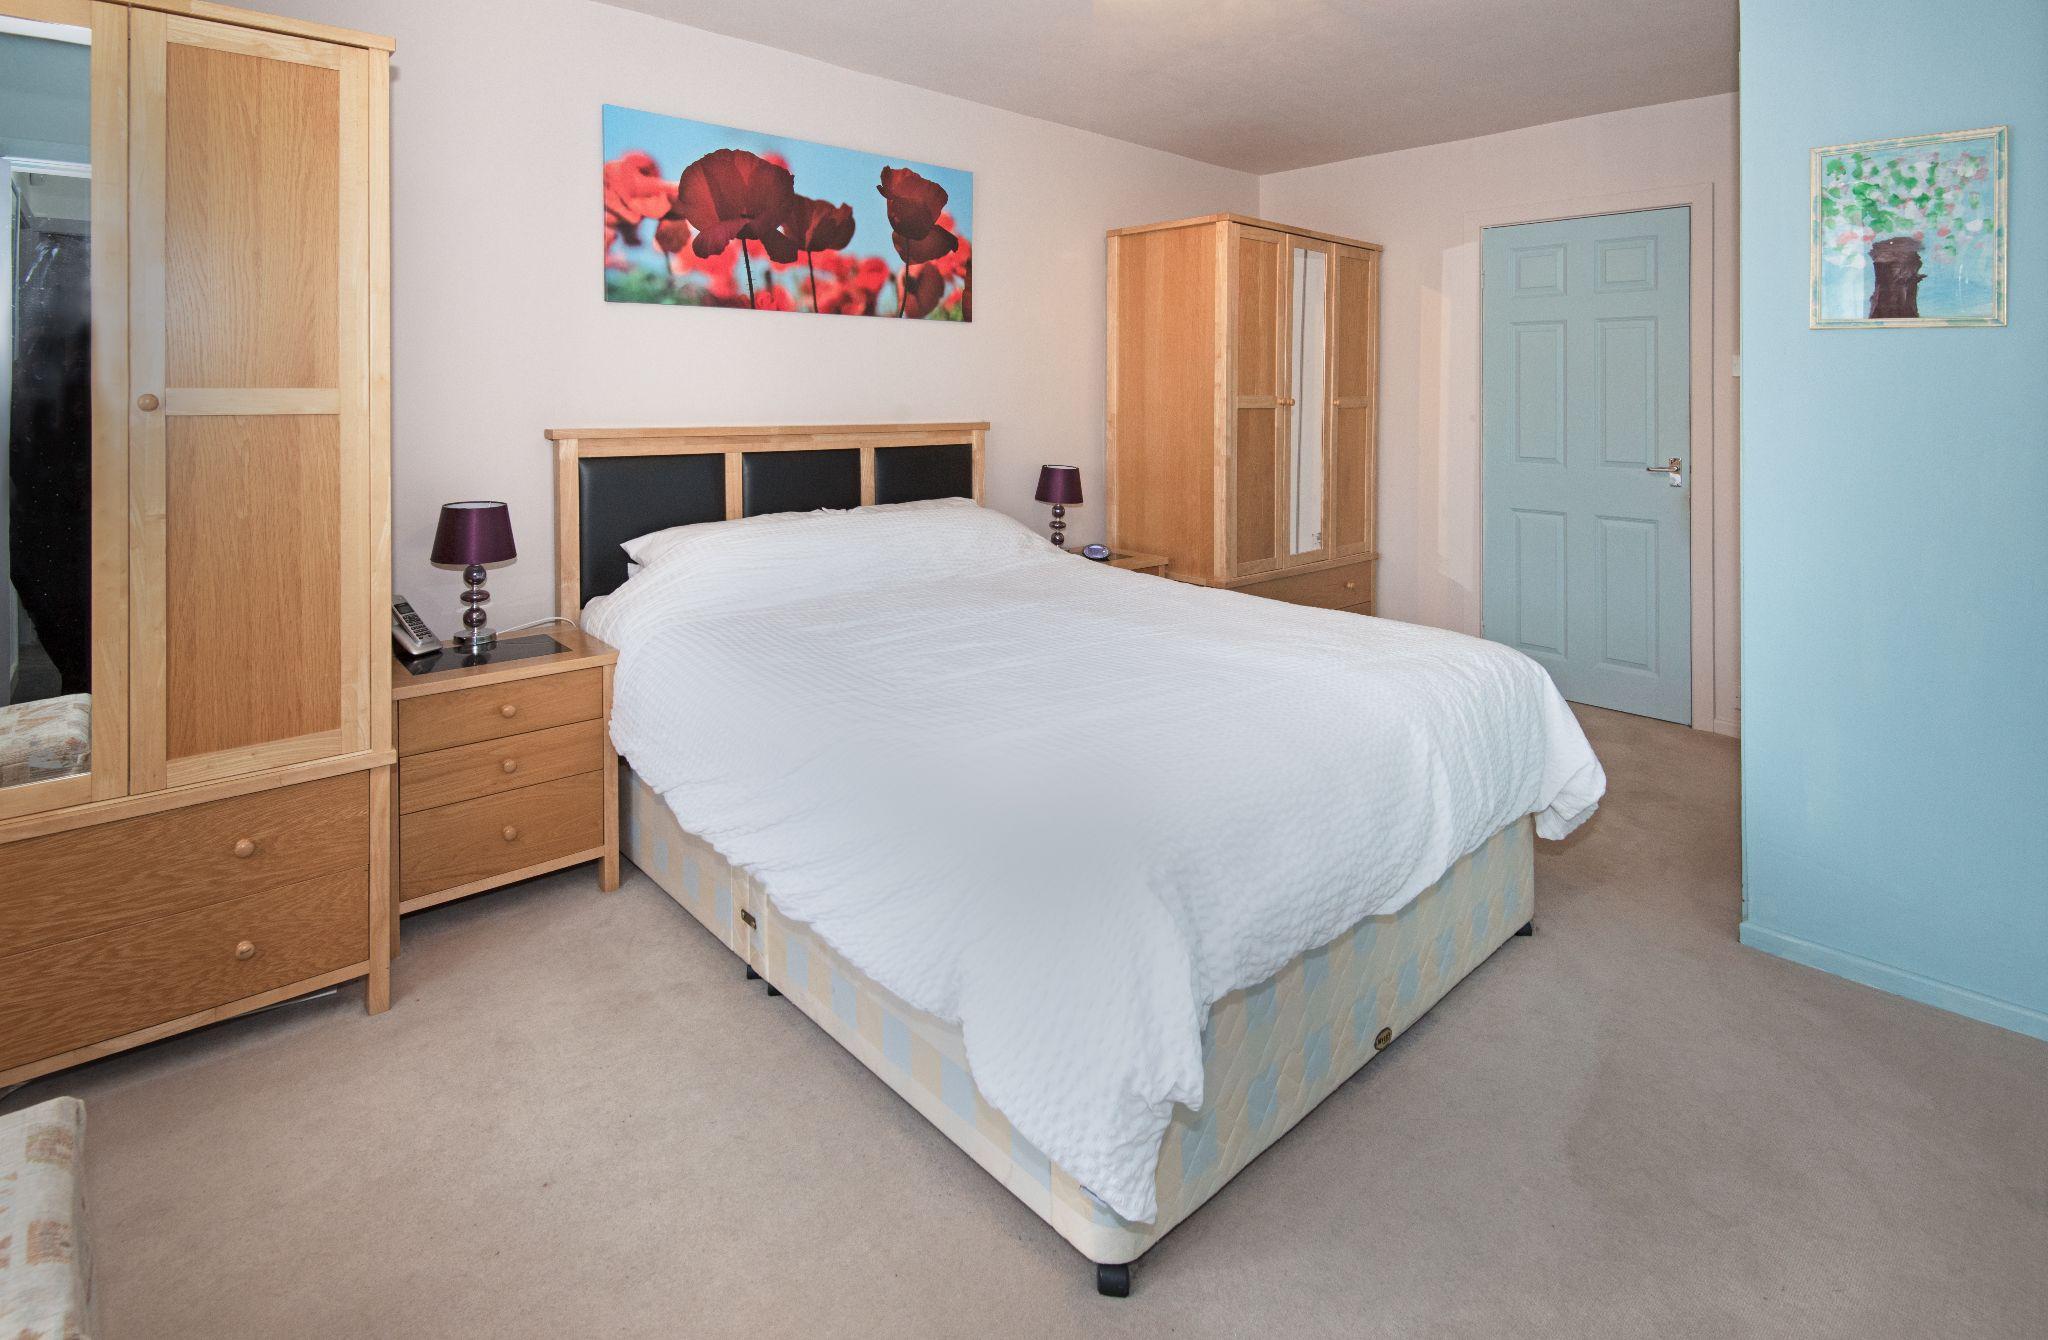 4 Bedroom Detached House For Sale - Primary Bedroom